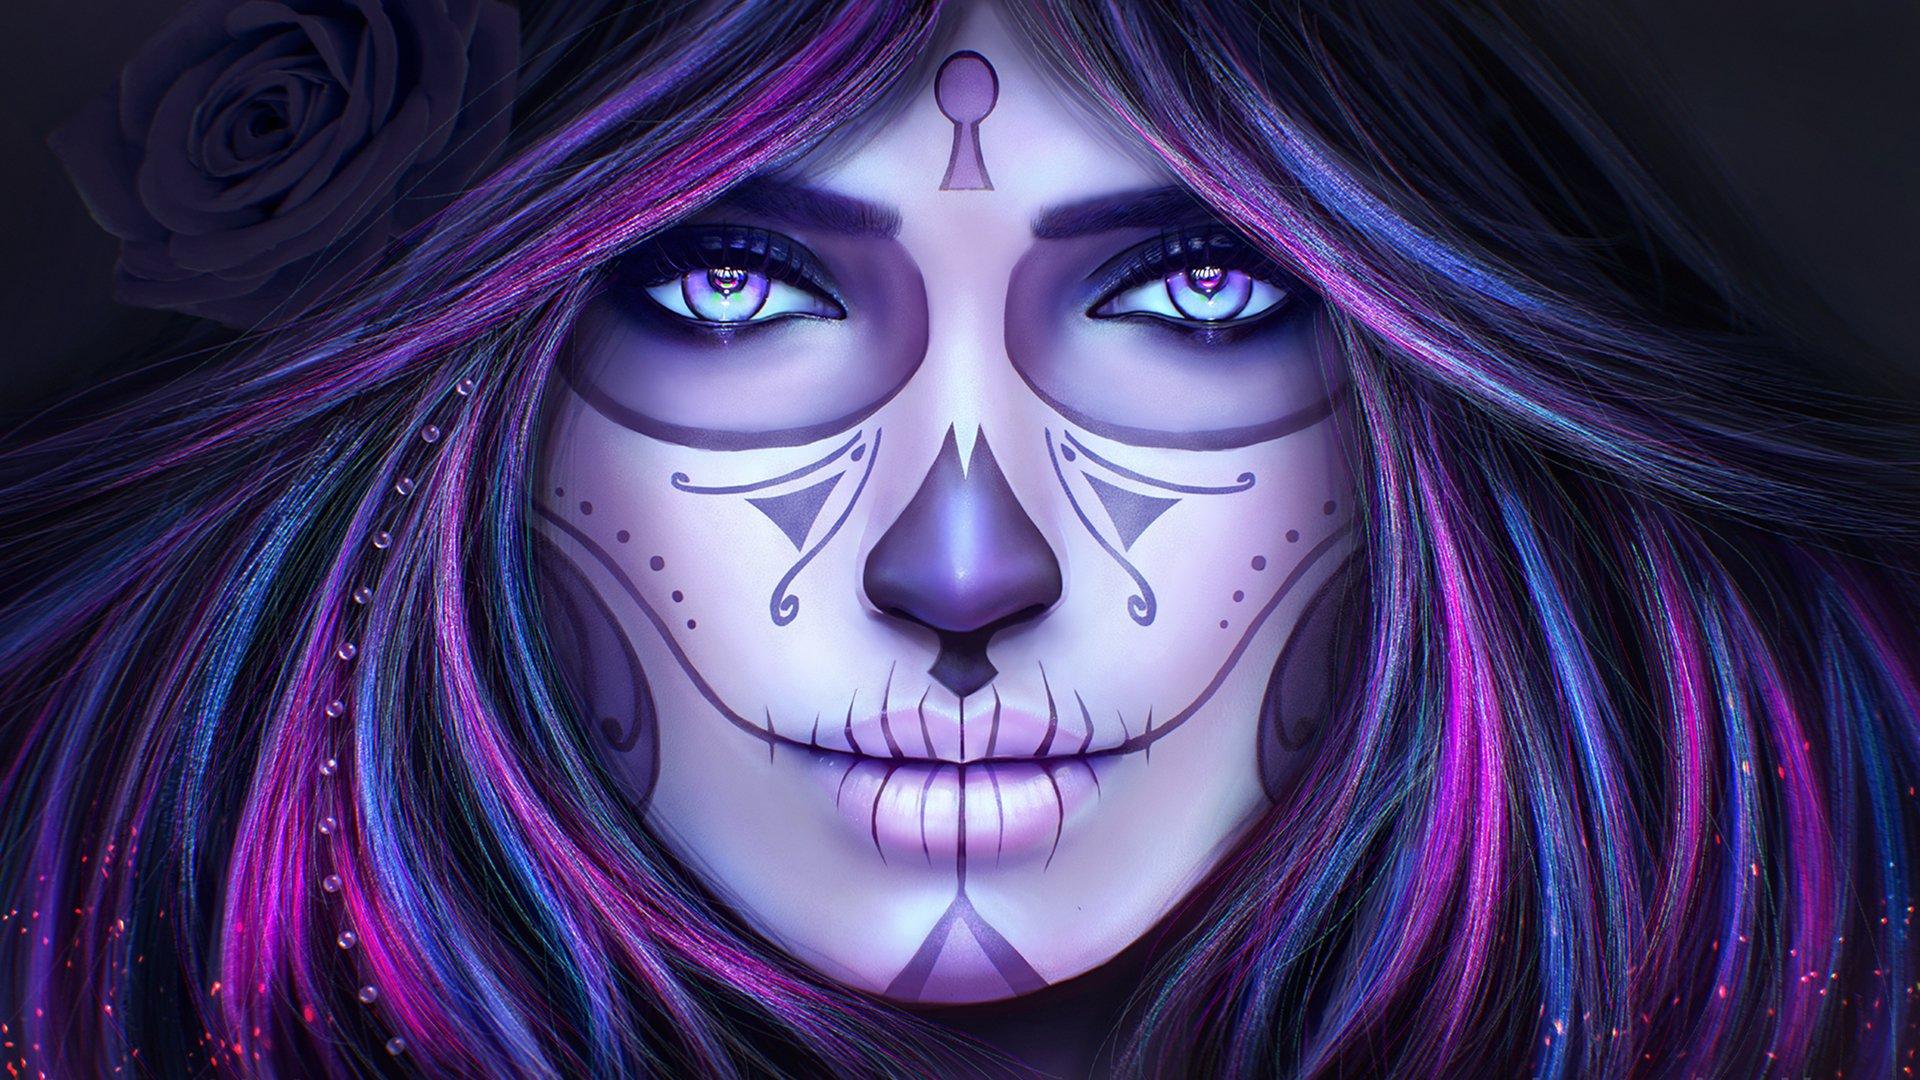 Sugar Skull Woman Wallpapers ID734024